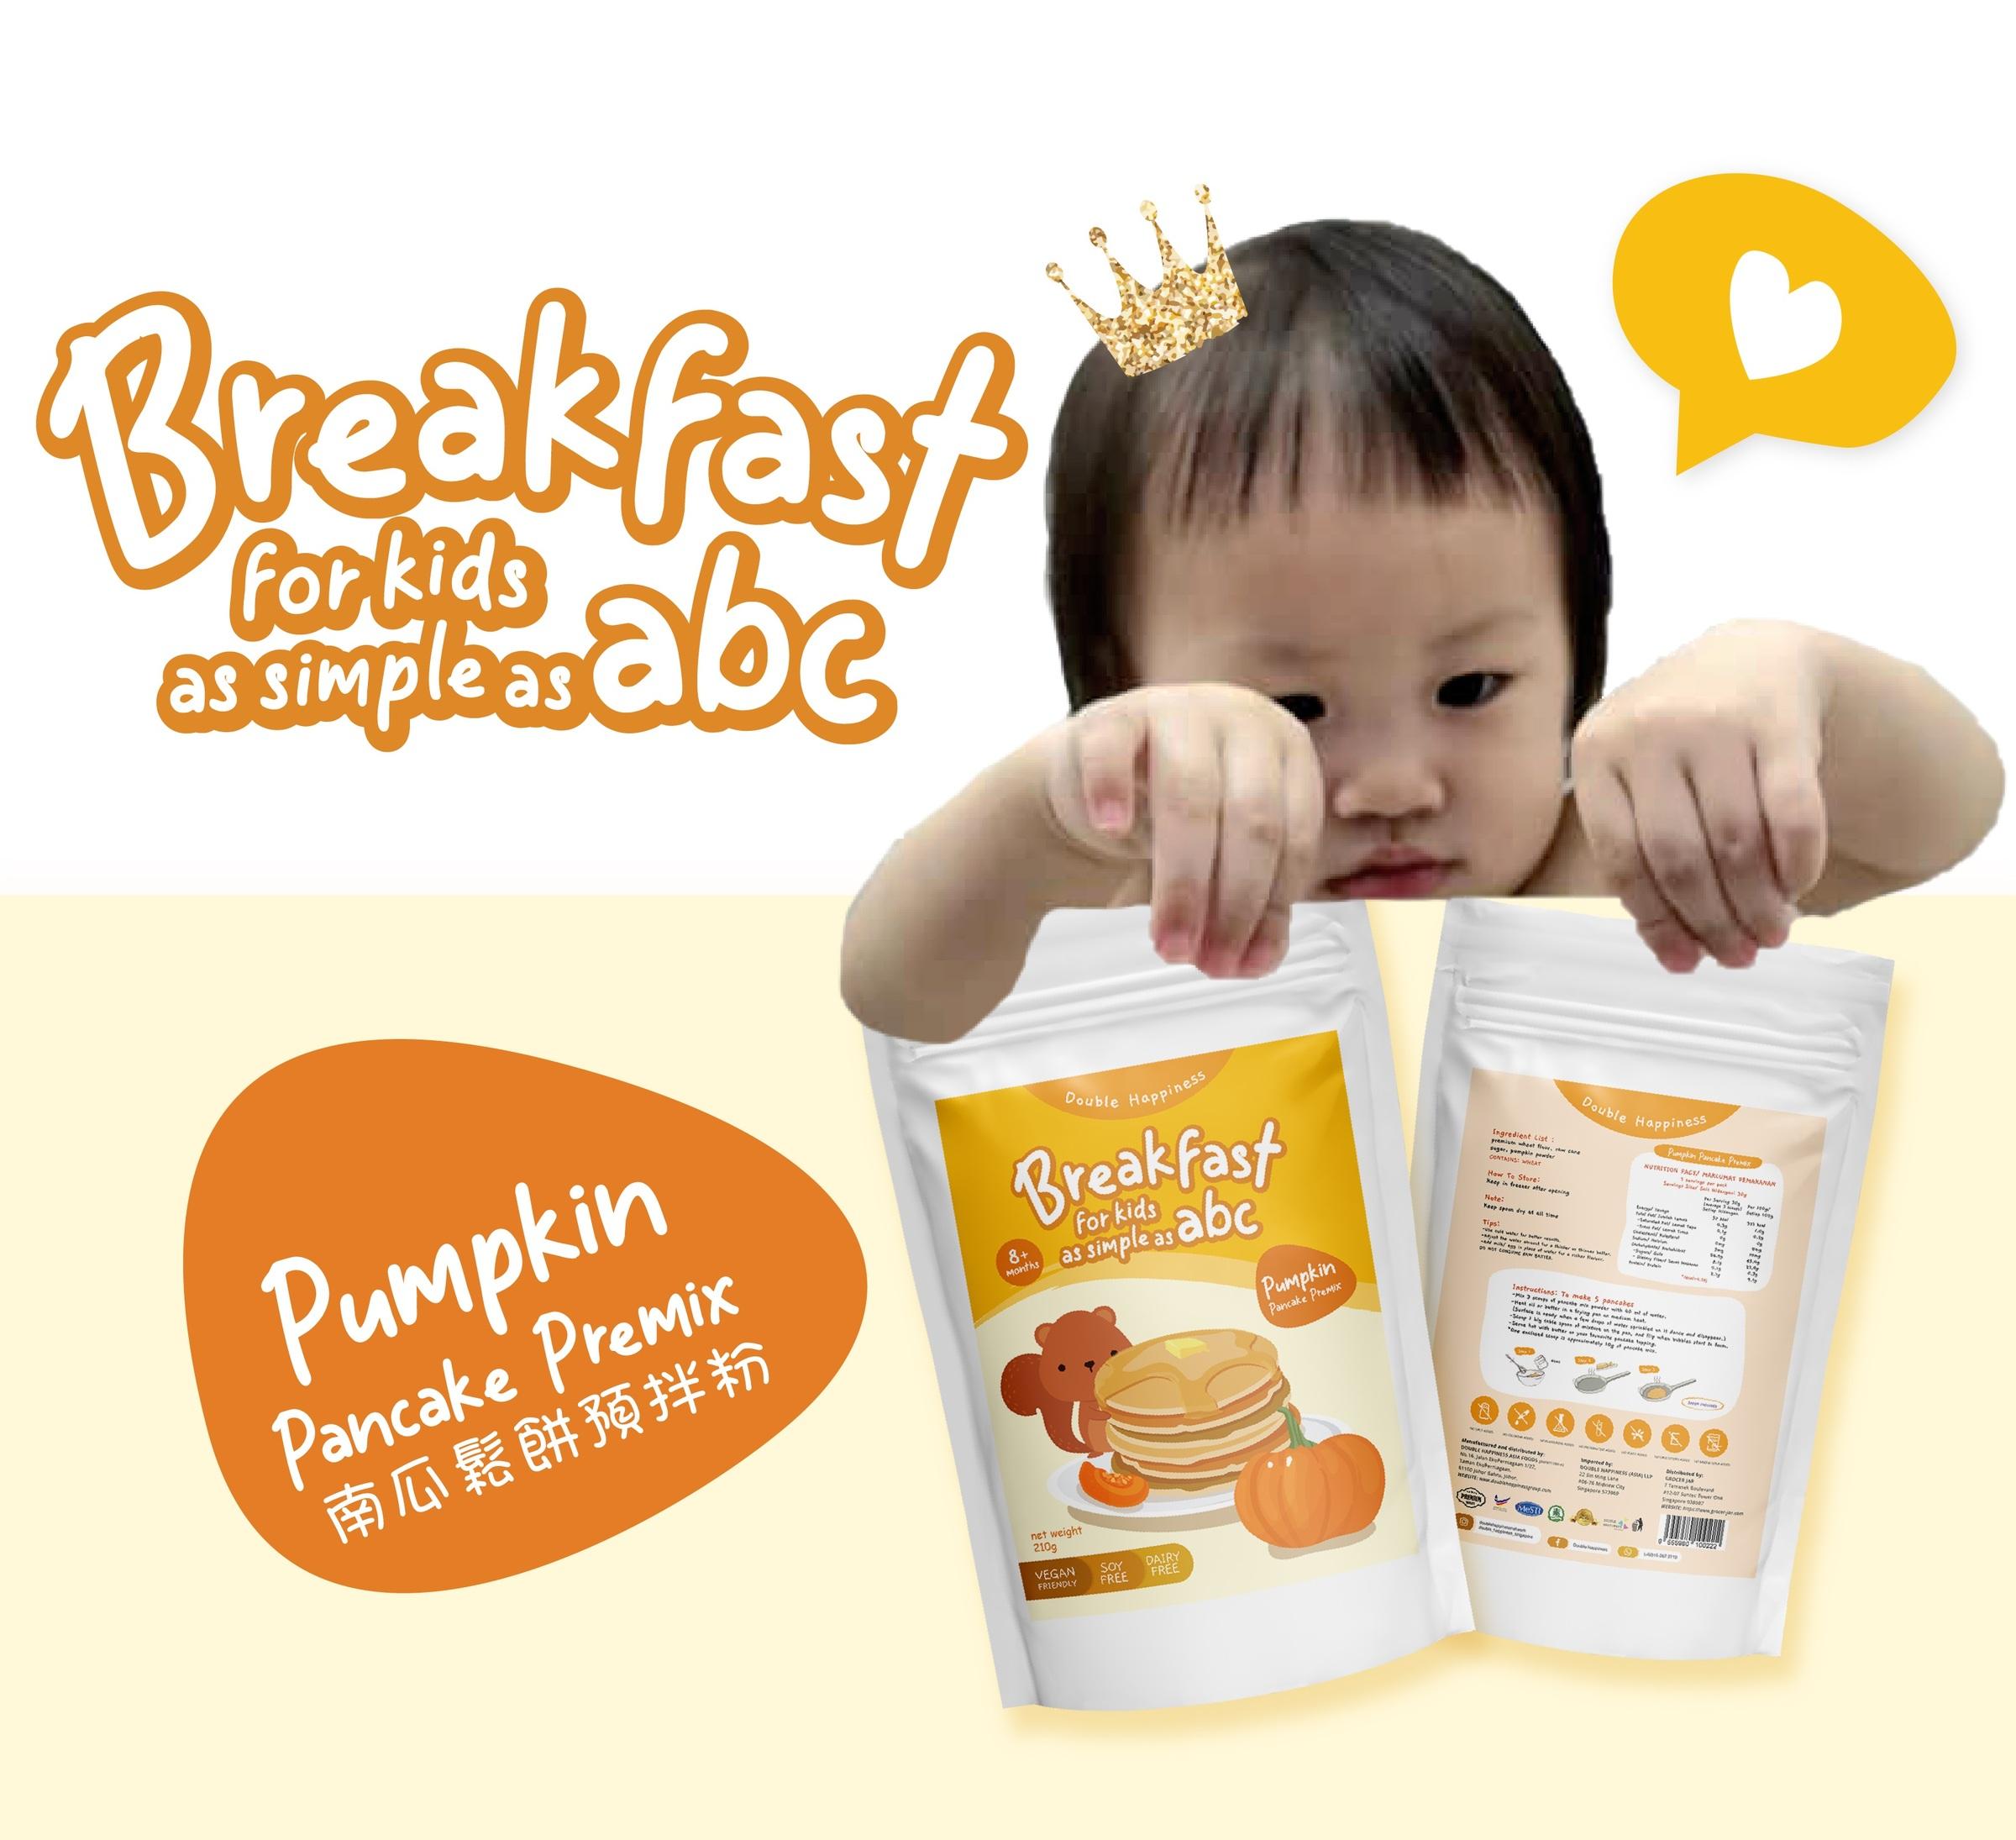 Pumpkin Veggie Premix intro.jpg